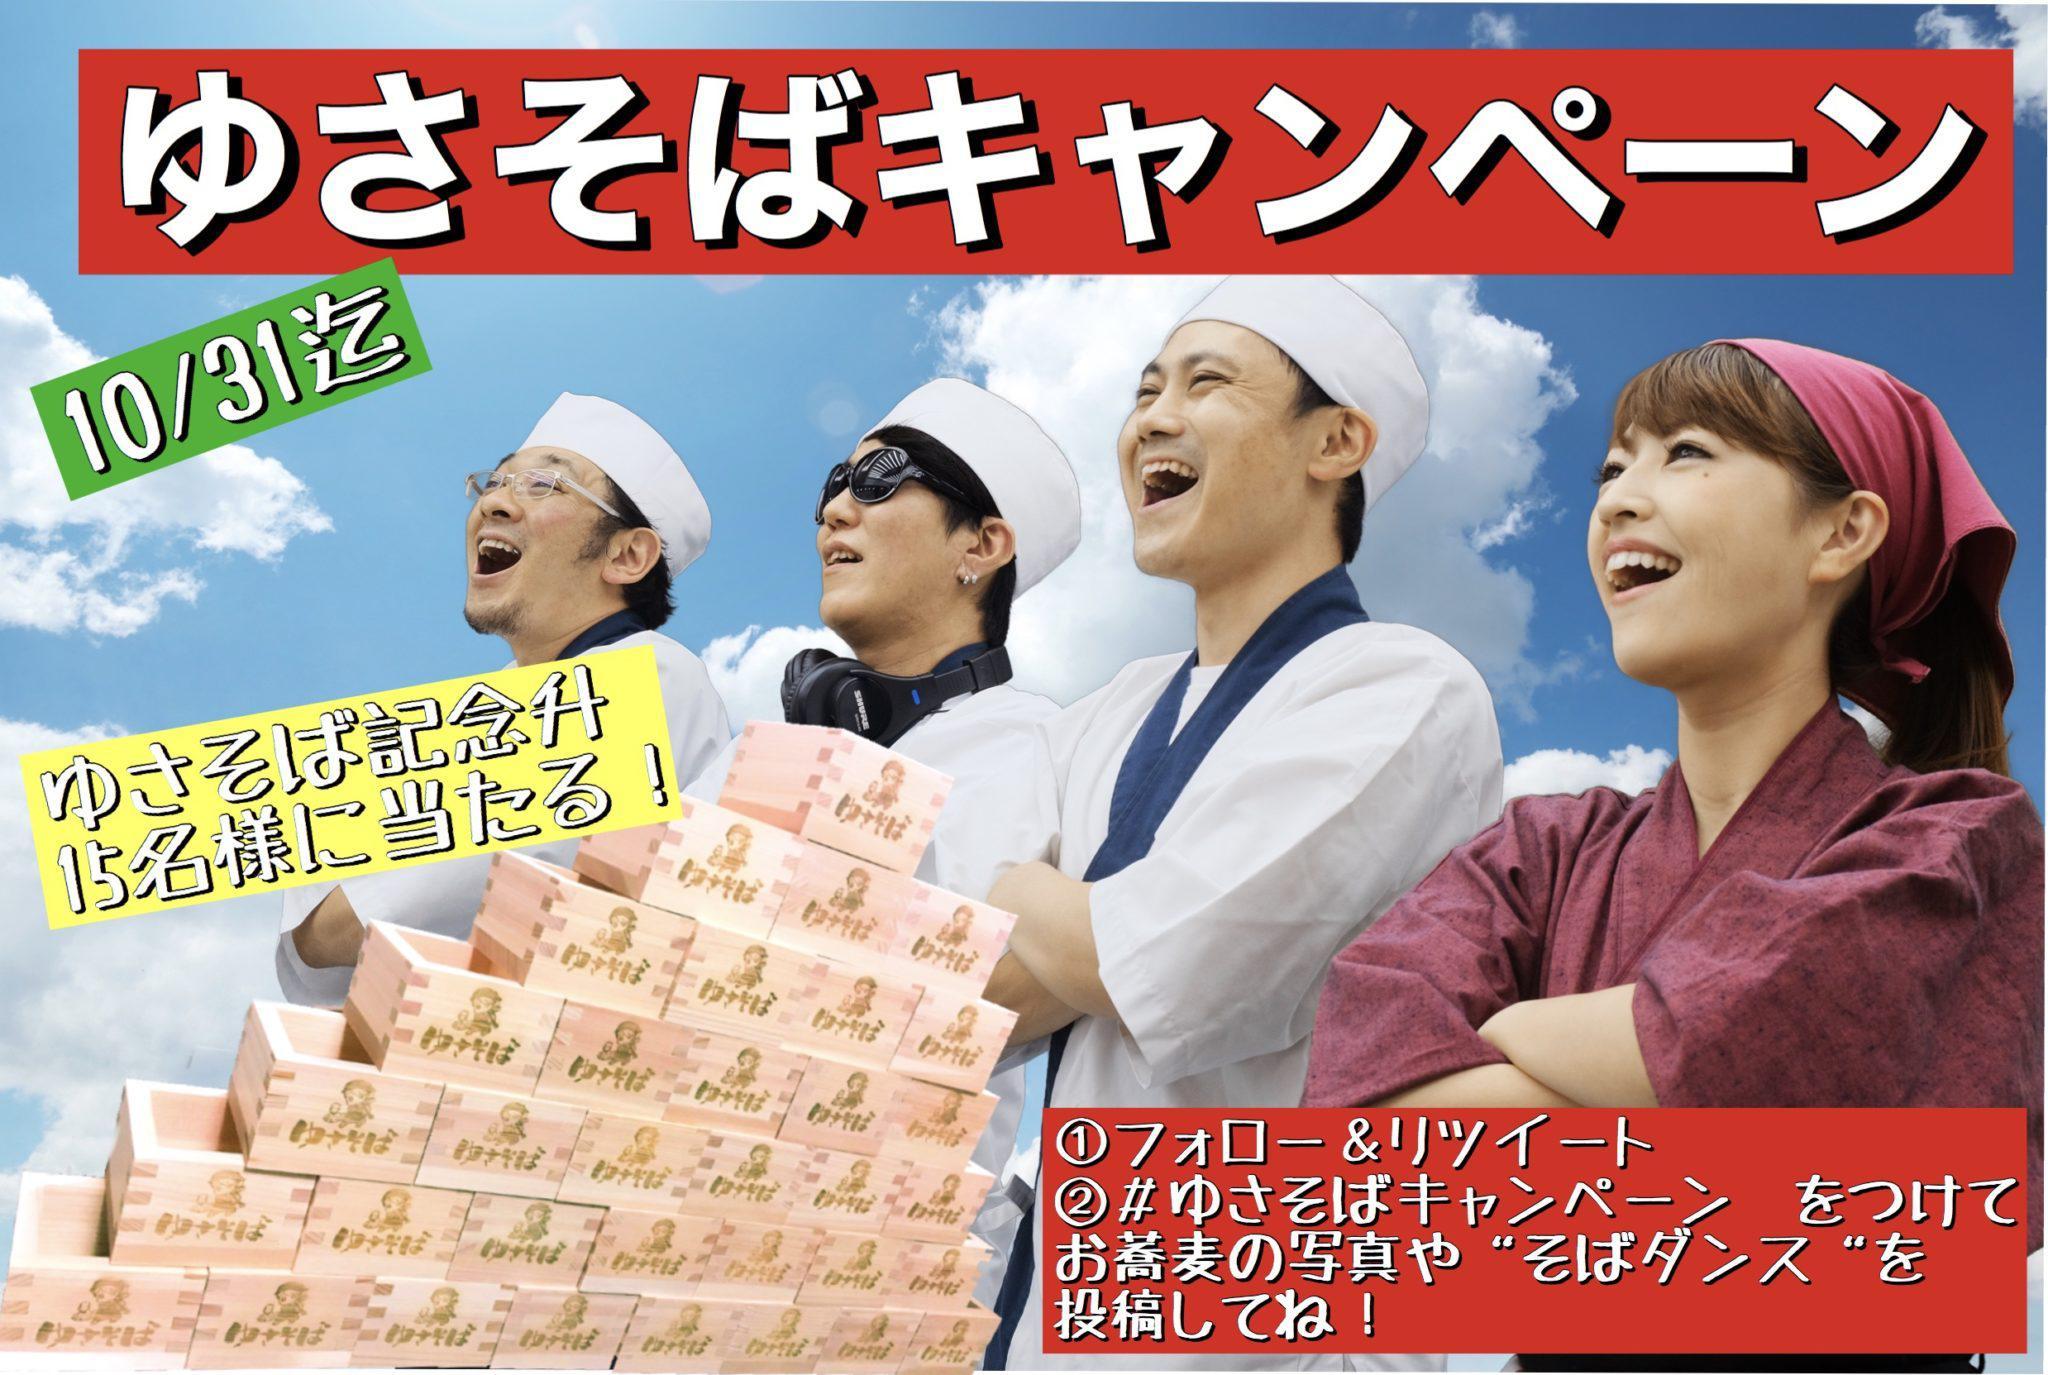 https://fujisoba.co.jp/news/assets/phonto-2048x1375.jpg